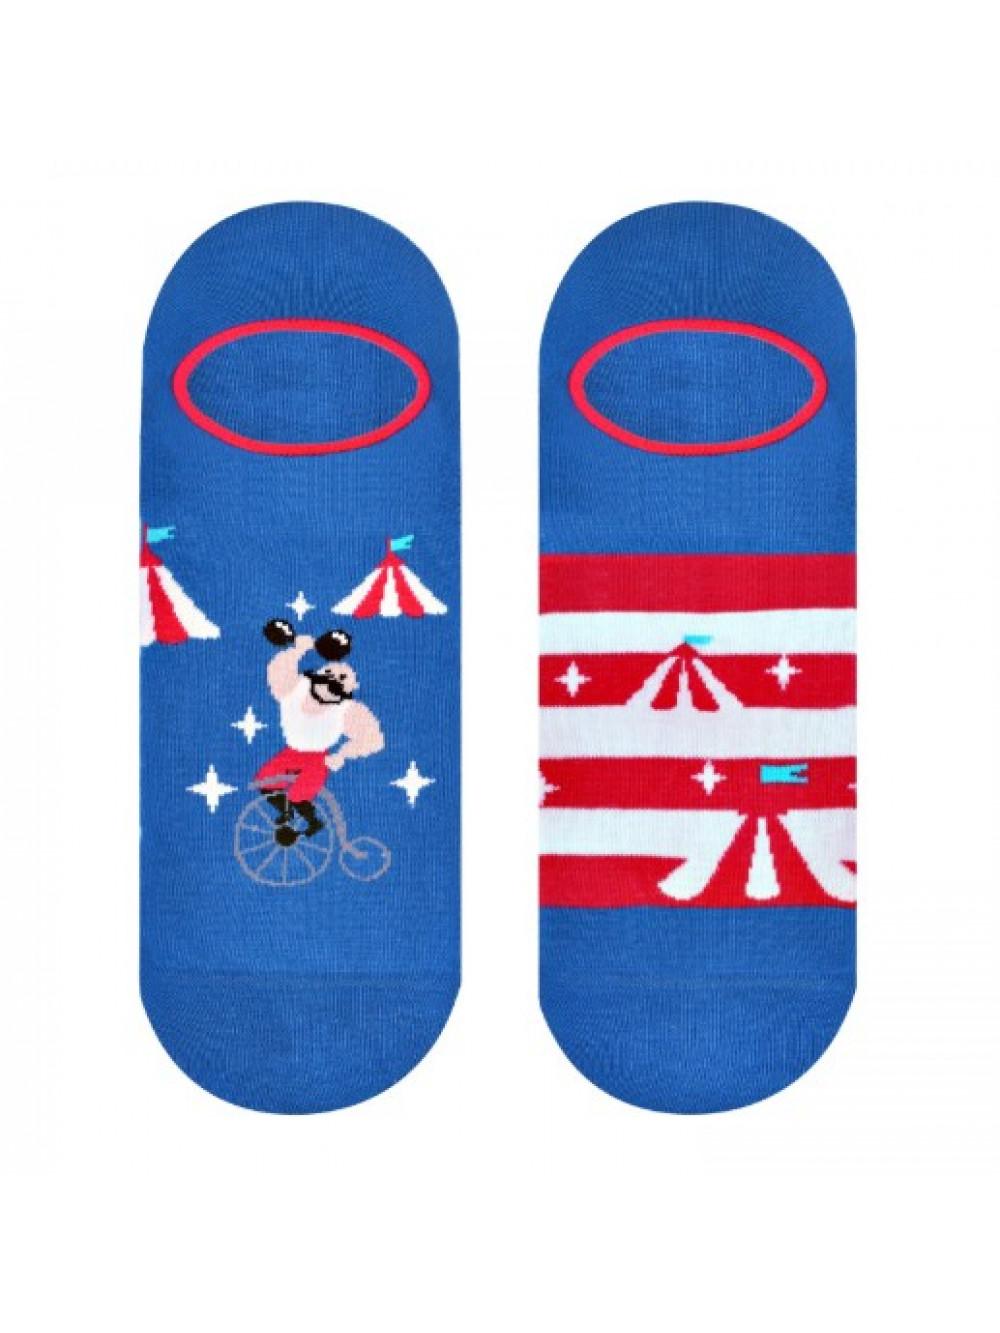 Ponožky More Cirkus modré